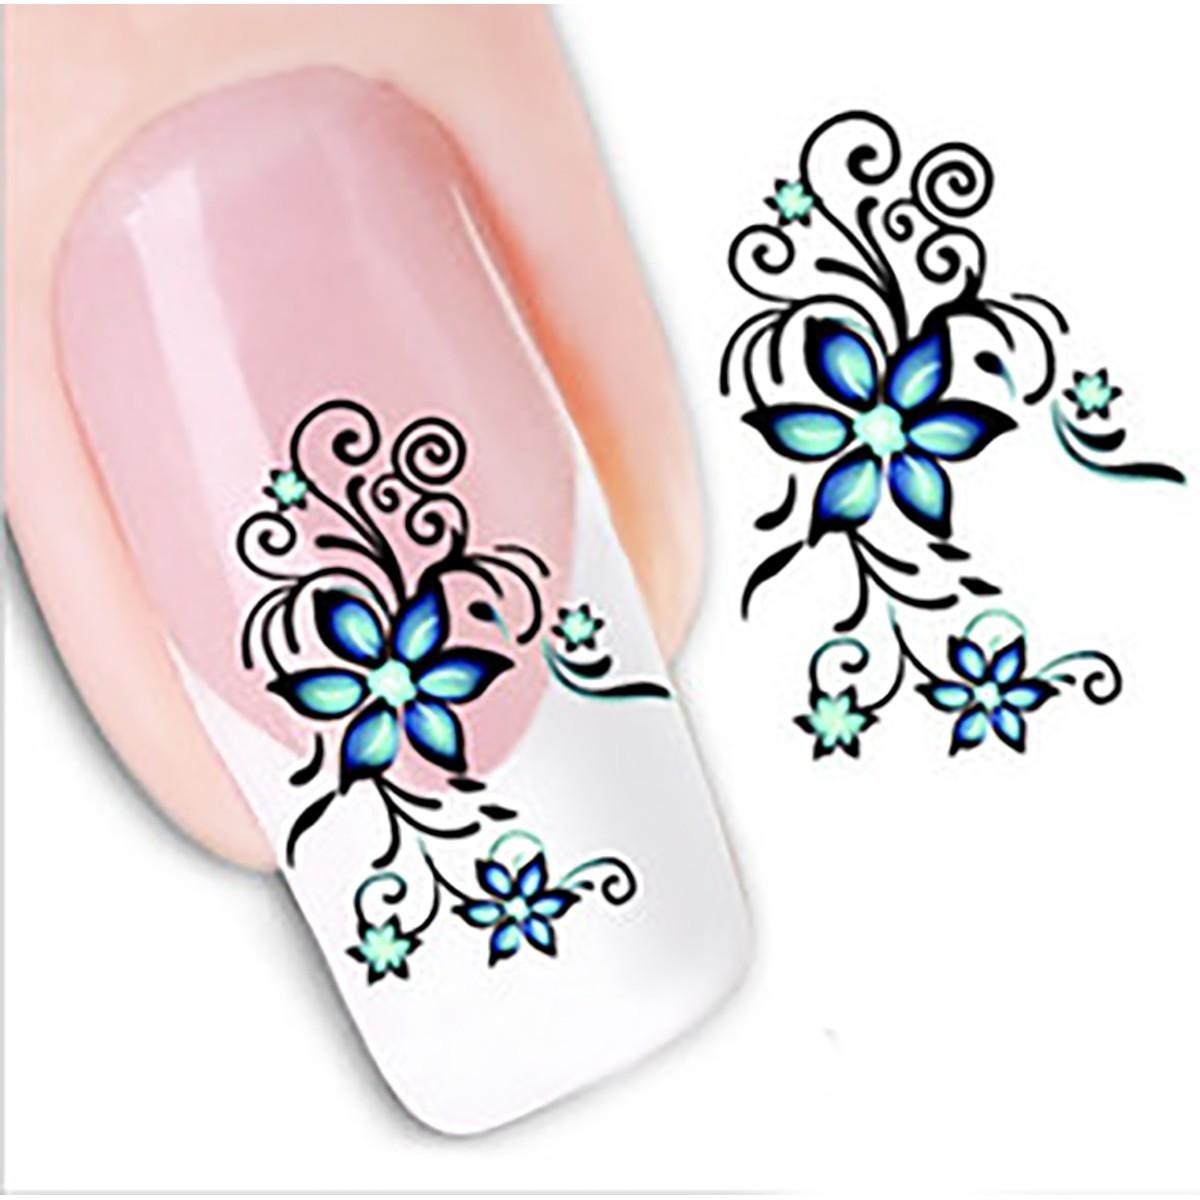 Kit de tatto mariposas para u as stickers al algua nail for Mariposas de decoracion para pared